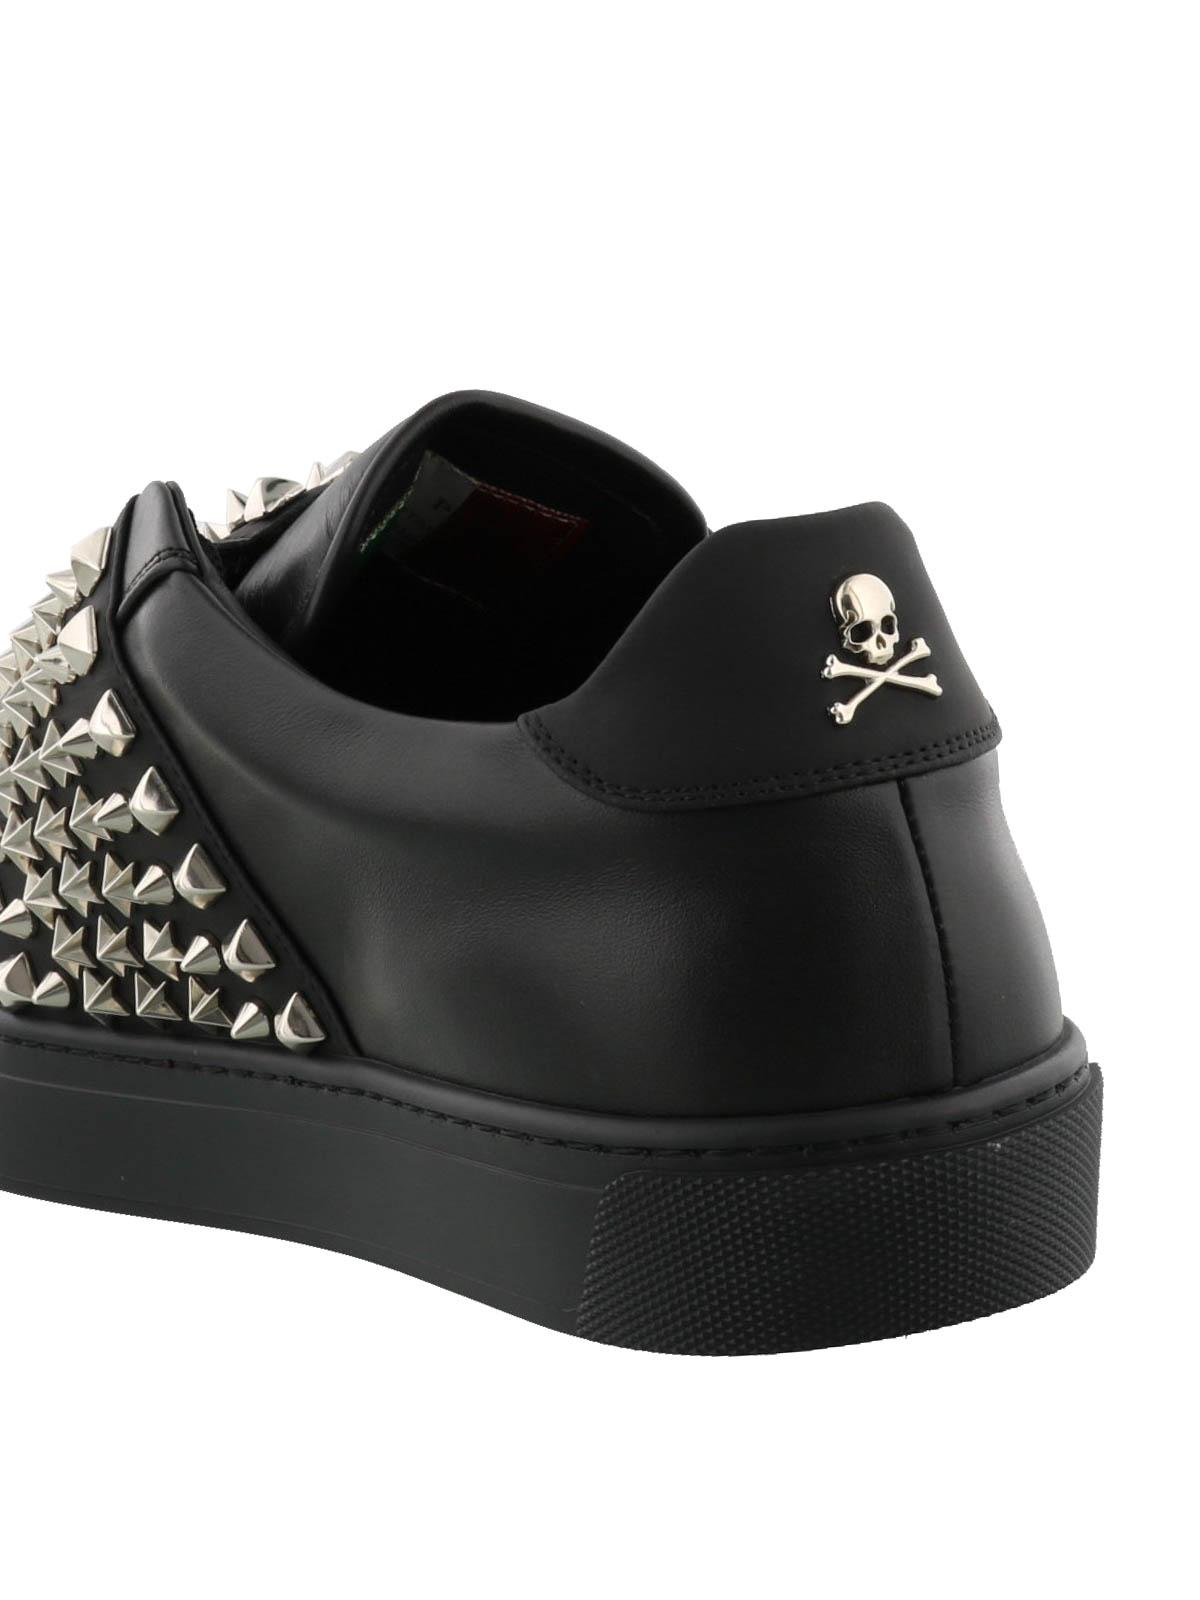 Philipp Plein - Nein sneakers with